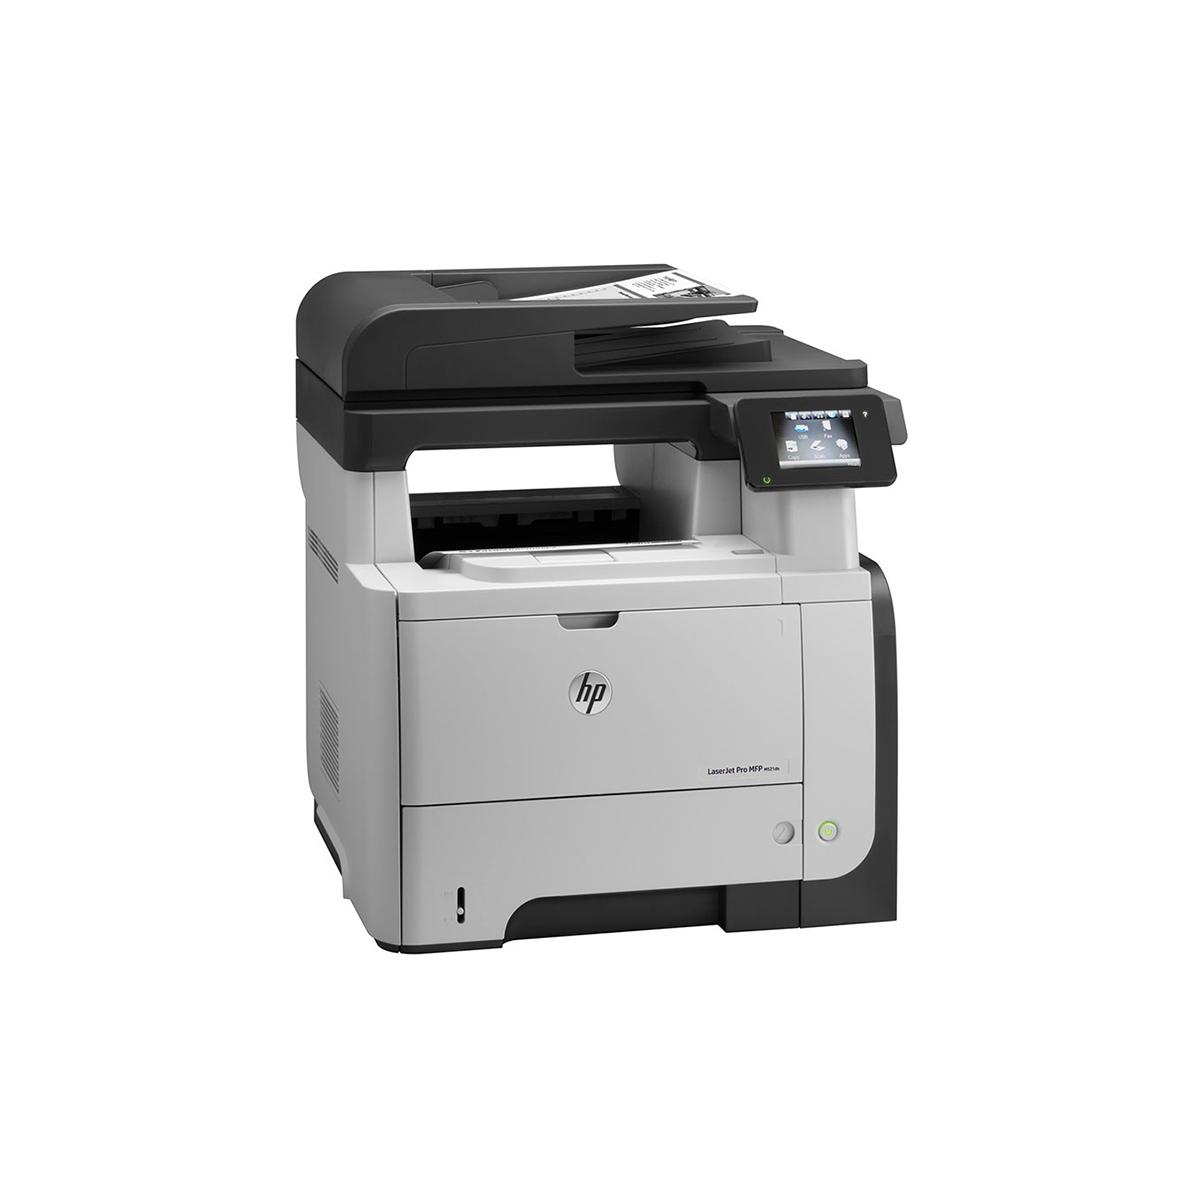 Impresora HP LaserJet Pro M521dn